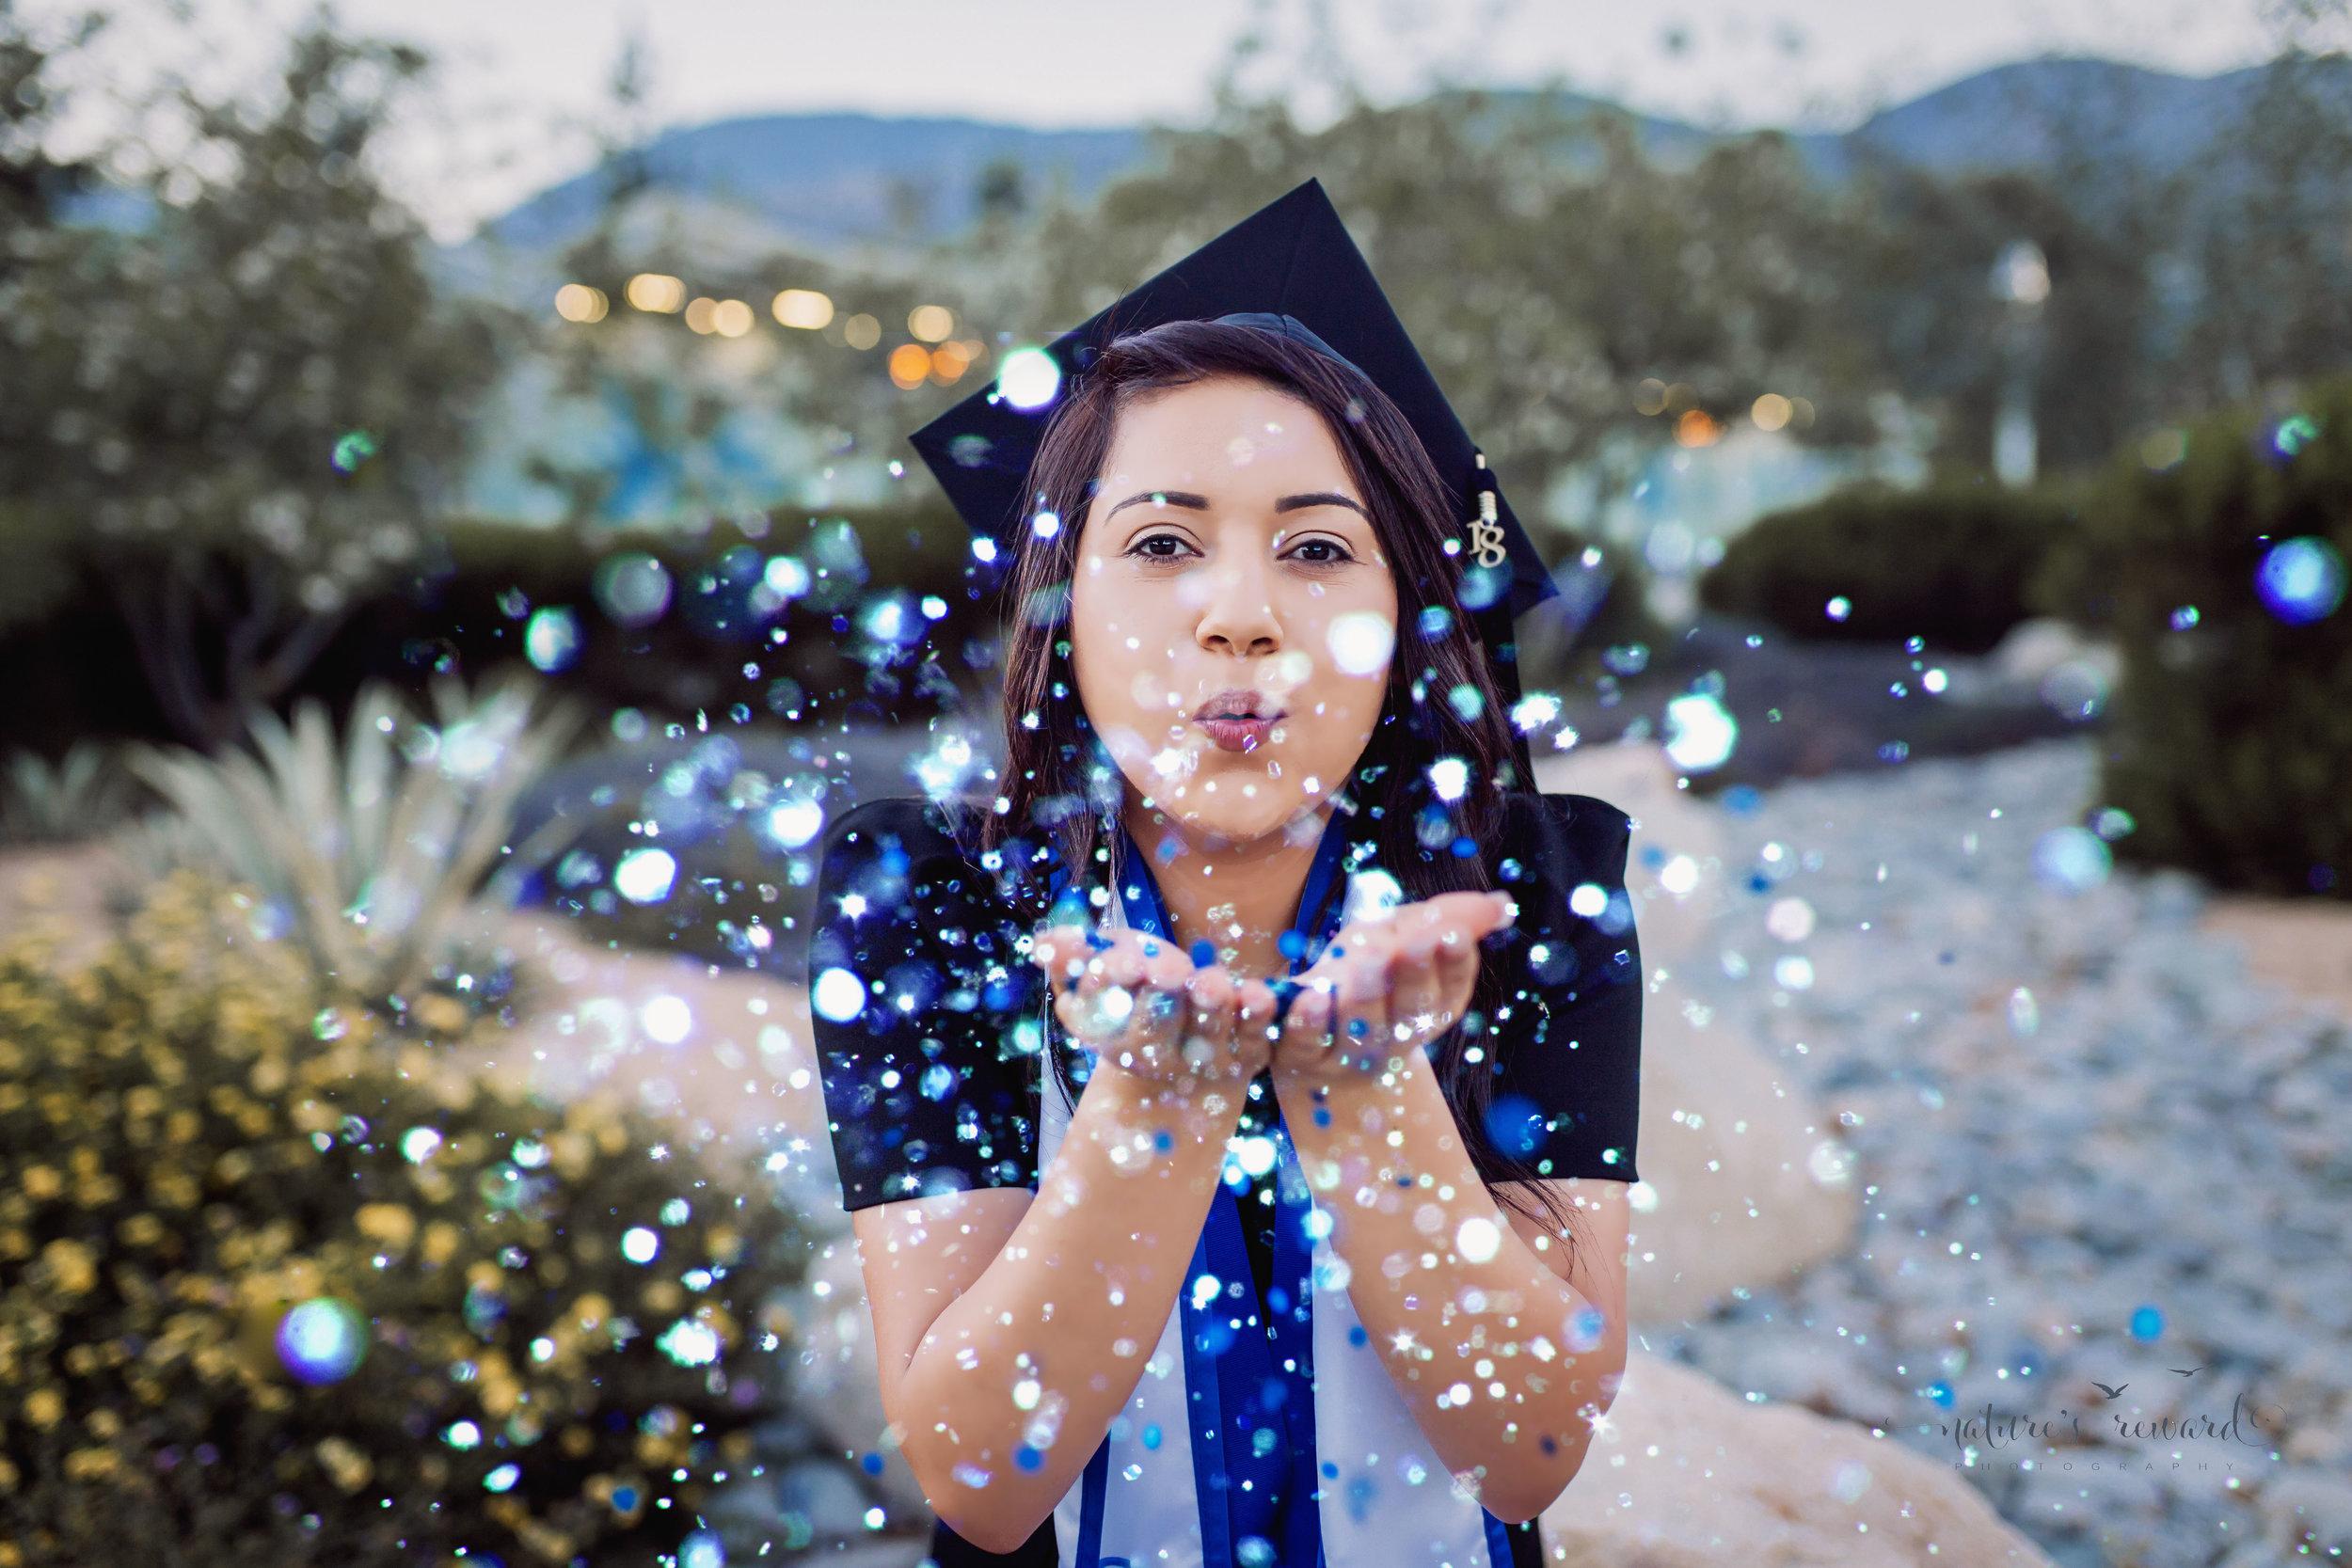 Class of 2018, California State University, San Bernardino Graduate wearing a black dress and Cap blowing celebratory glitter, in this Senior Portrait by Nature's Reward Photography.